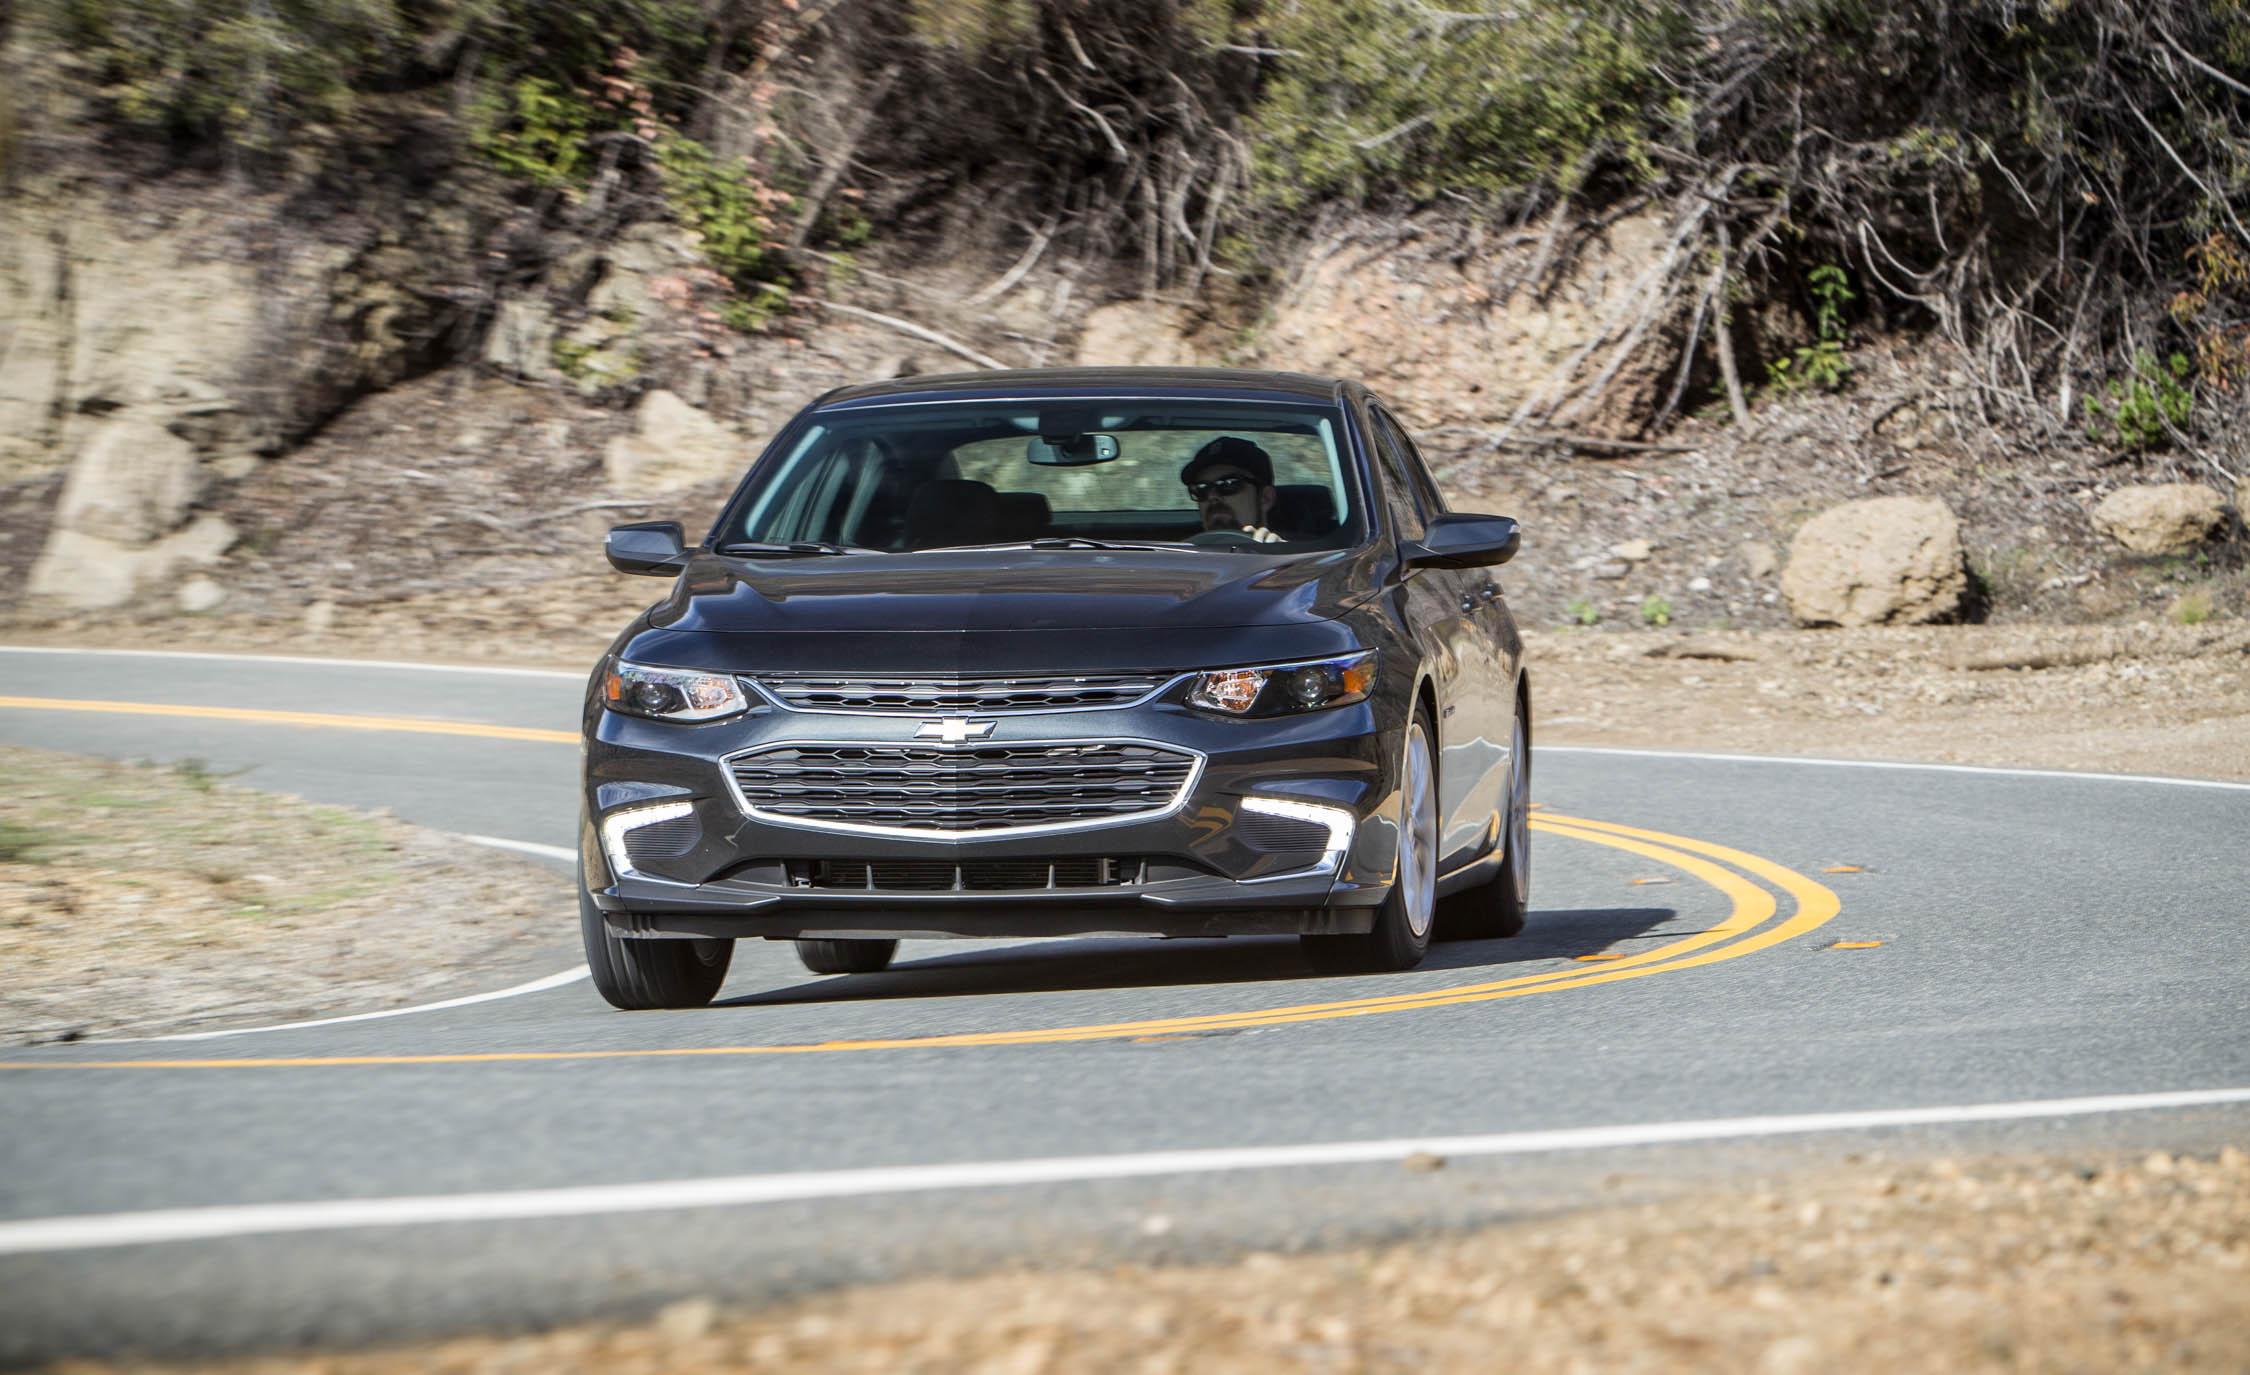 2016 Chevrolet Malibu LT Test Front View